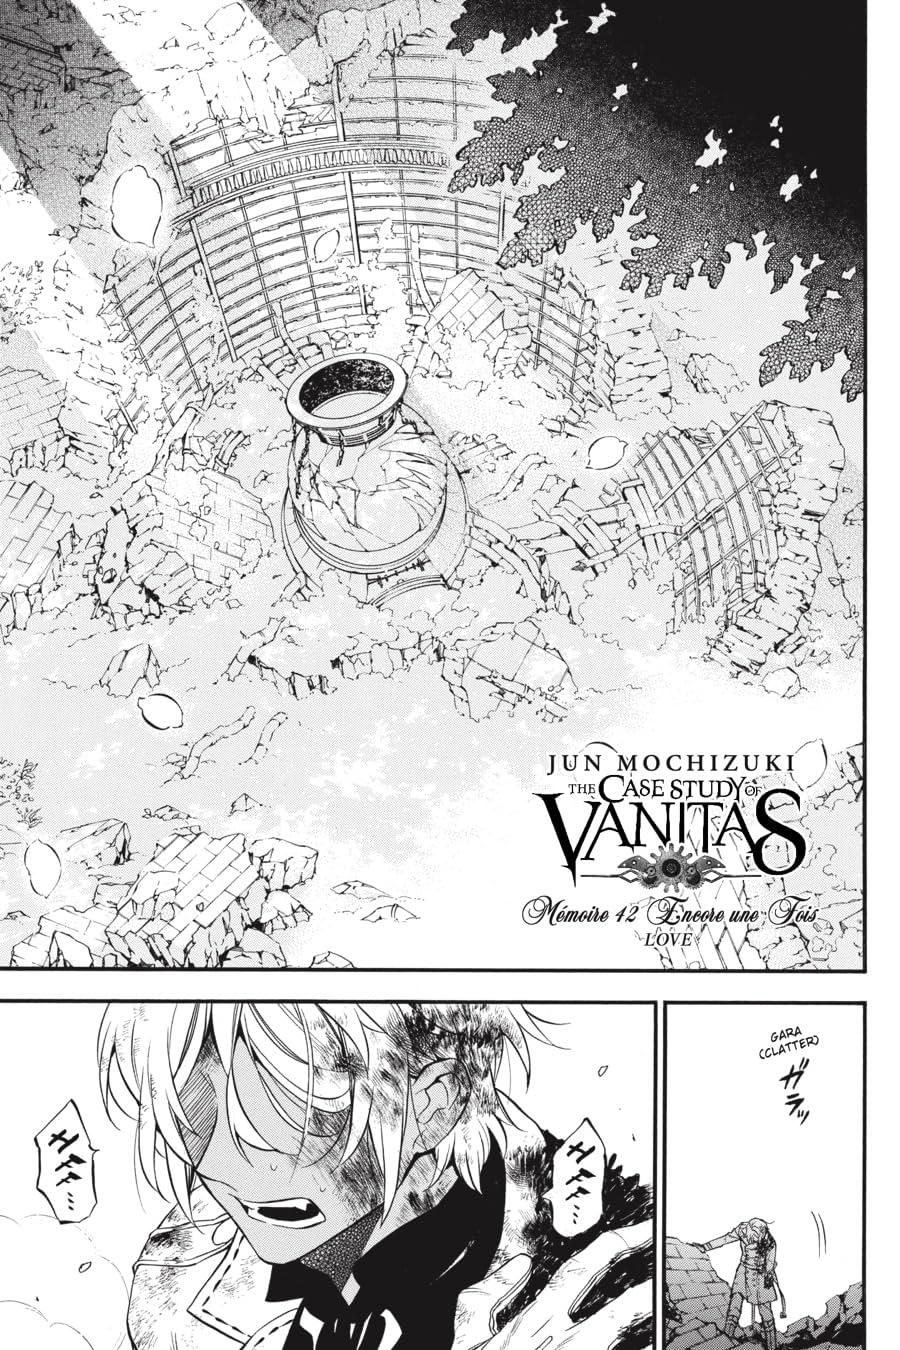 The Case Study of Vanitas #42